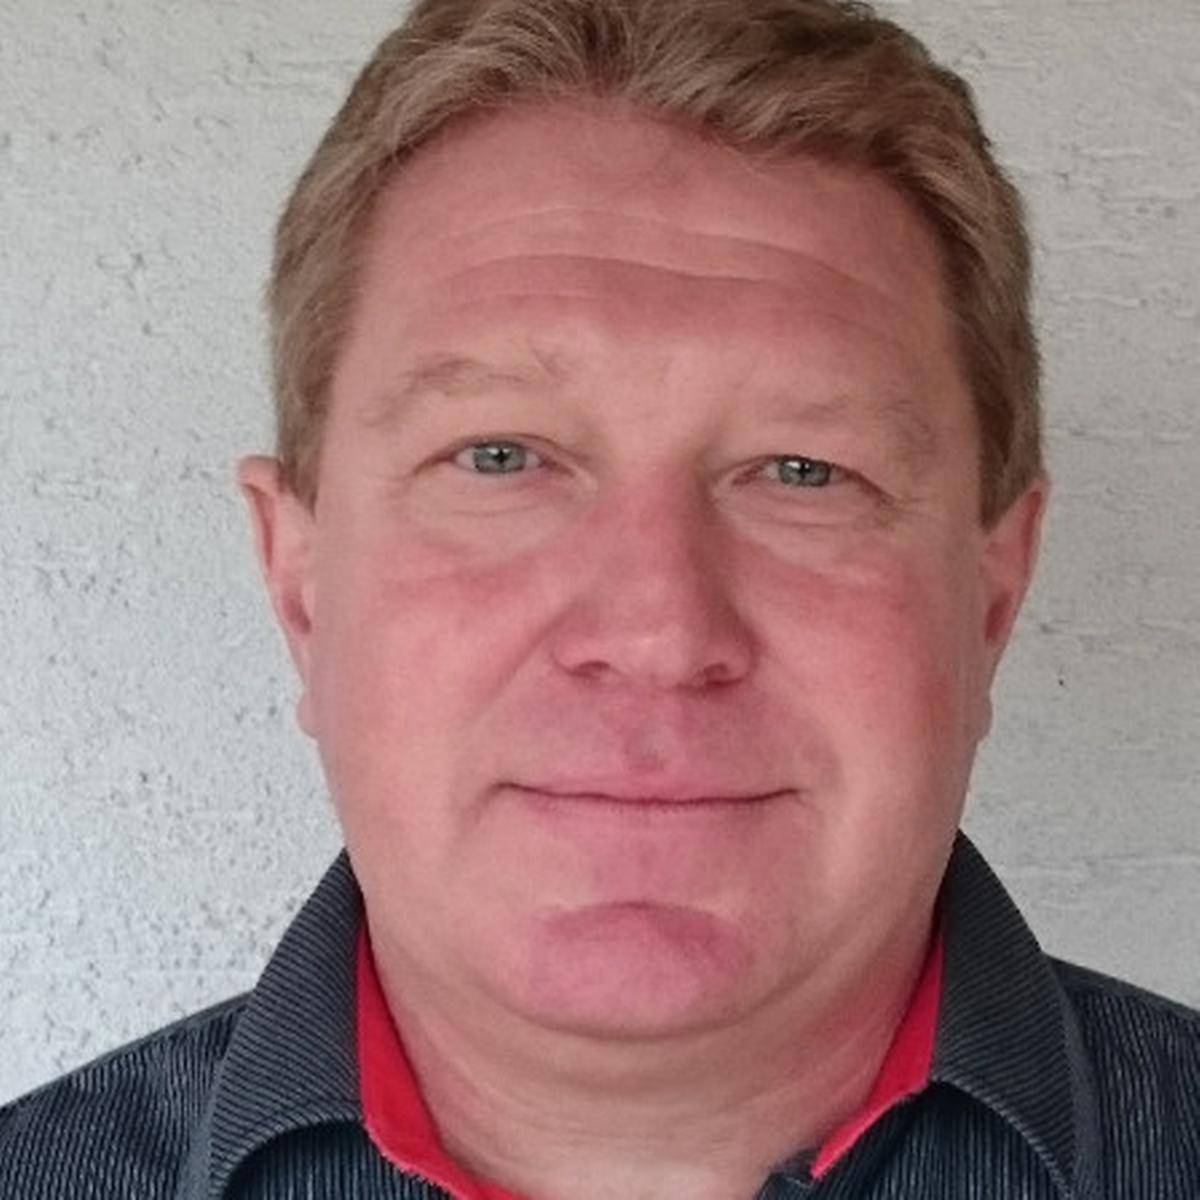 PaedDr. Vlastimil Pecha - nezávislý konzultant, kouč, moderátor, poradce a trenér